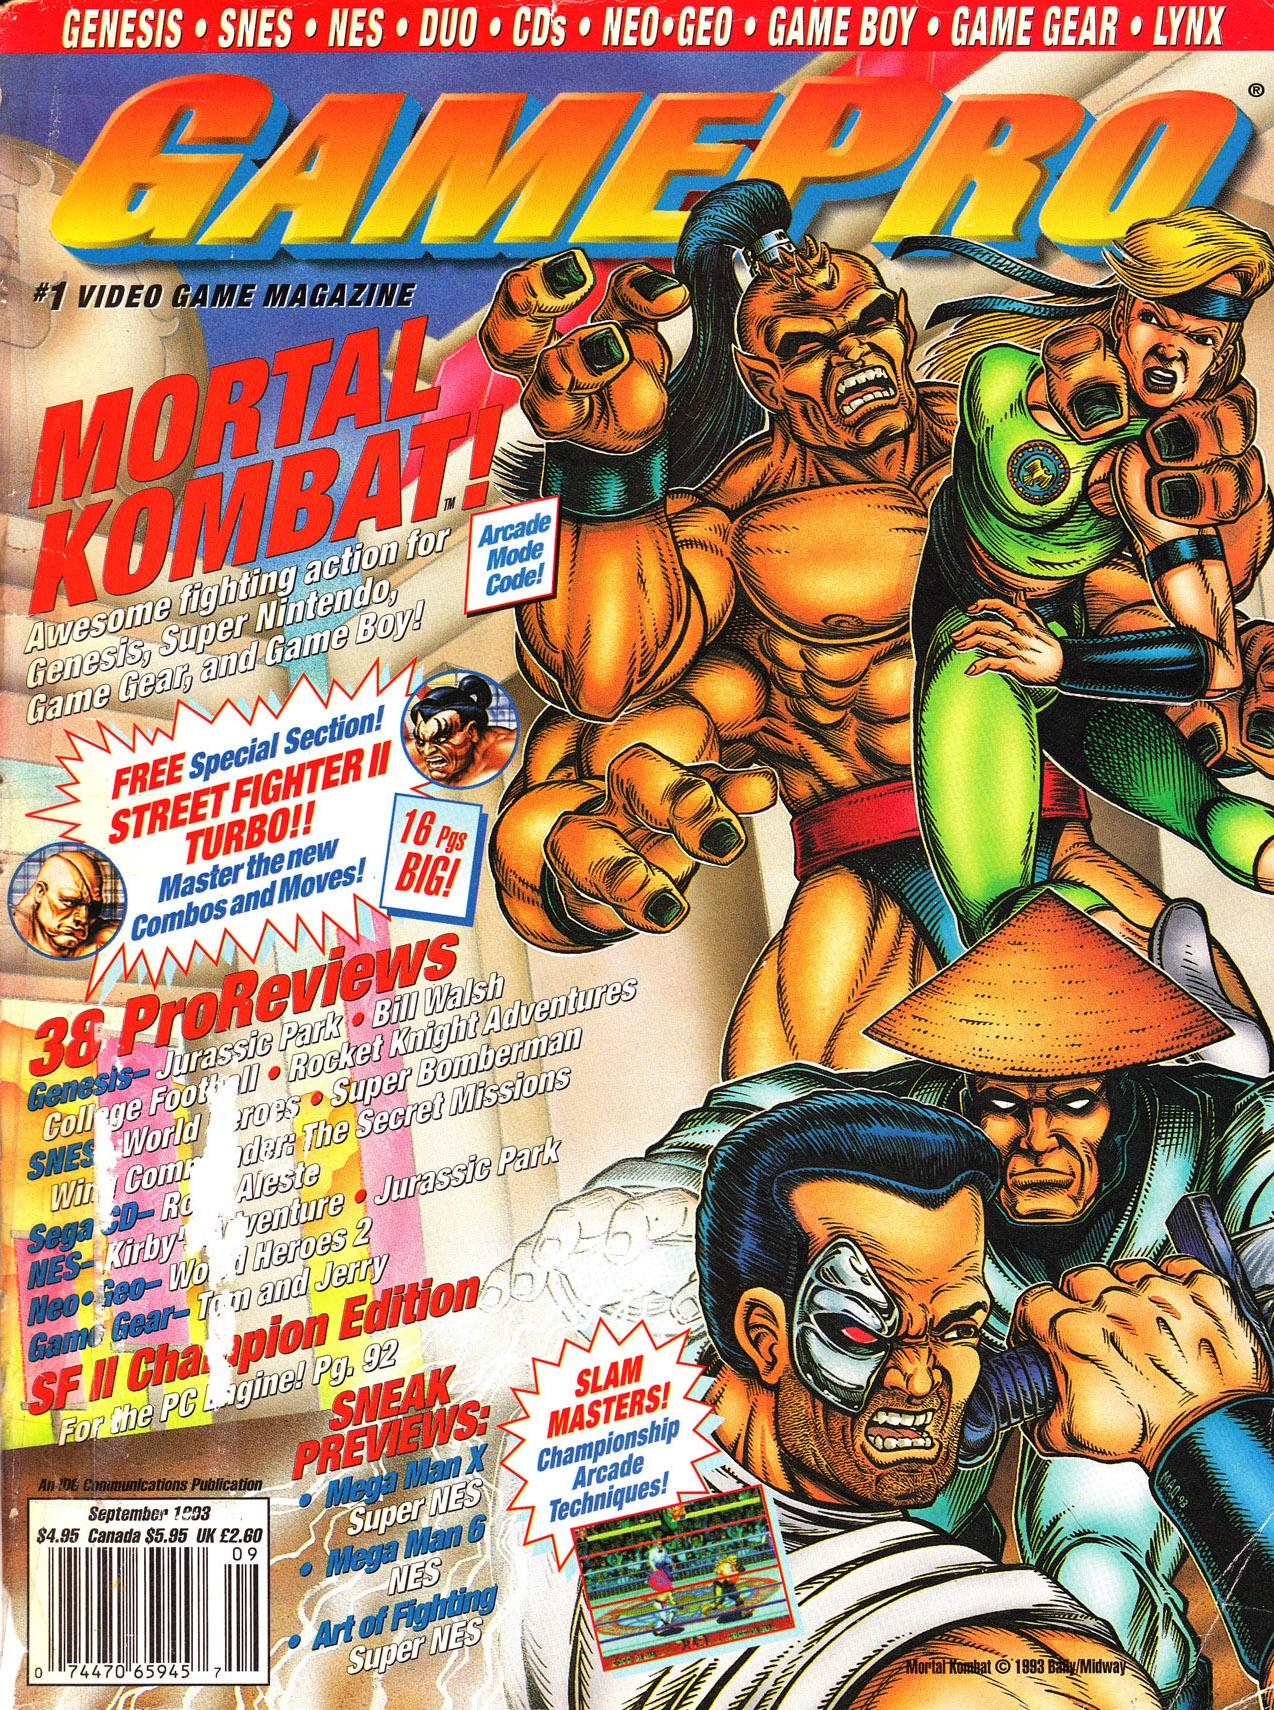 Vintage Genesis magazine January 1982 volume 9, no. 6